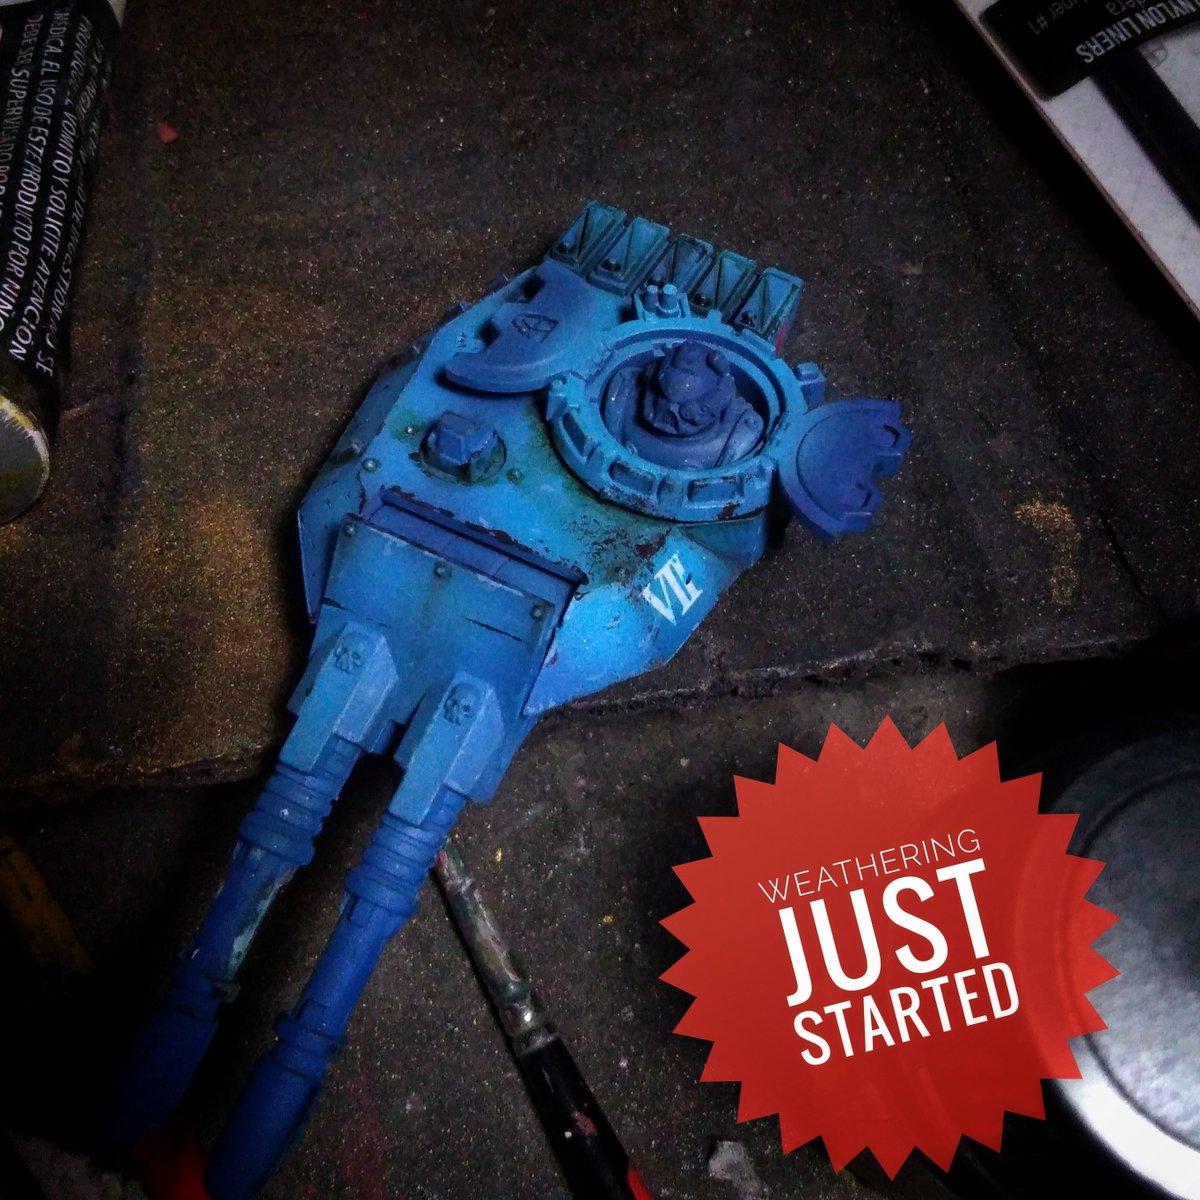 #PaintingWarhammer #paint #hobby #gamesworkshop #40k #spacemarines #wip #tank #blue #ultramarine #astartes #predator